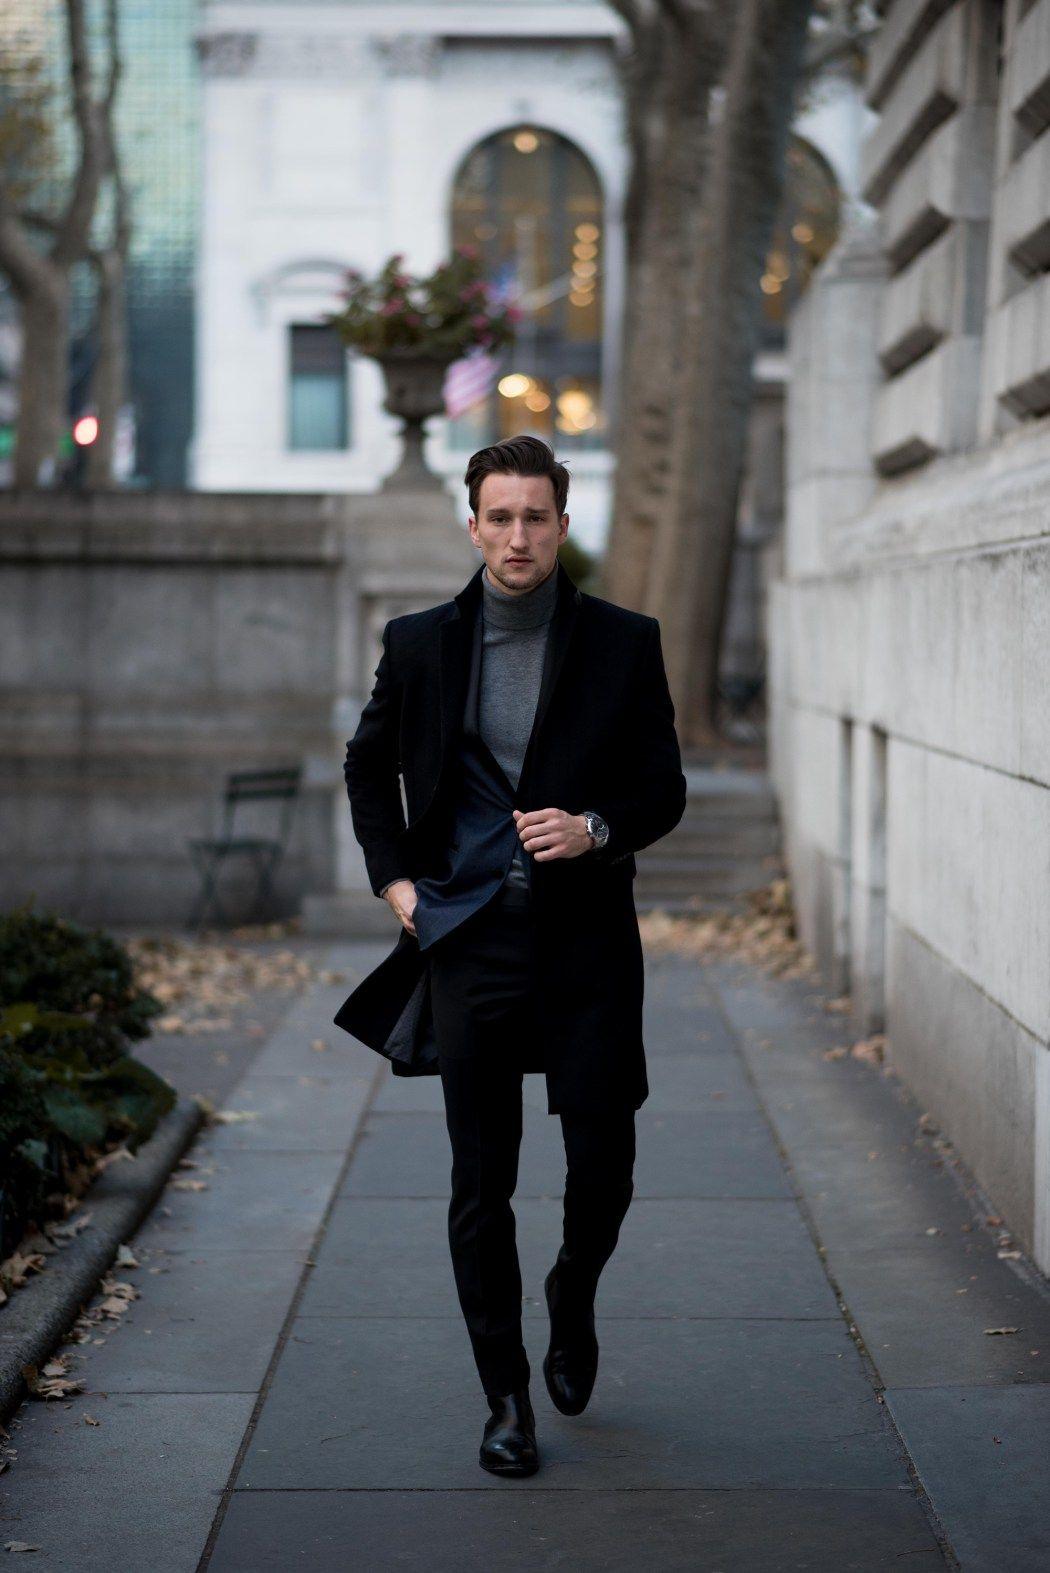 808c1e9ee521 Denim tuxedo blazer + gray turtleneck + black pants | Men's Style ...